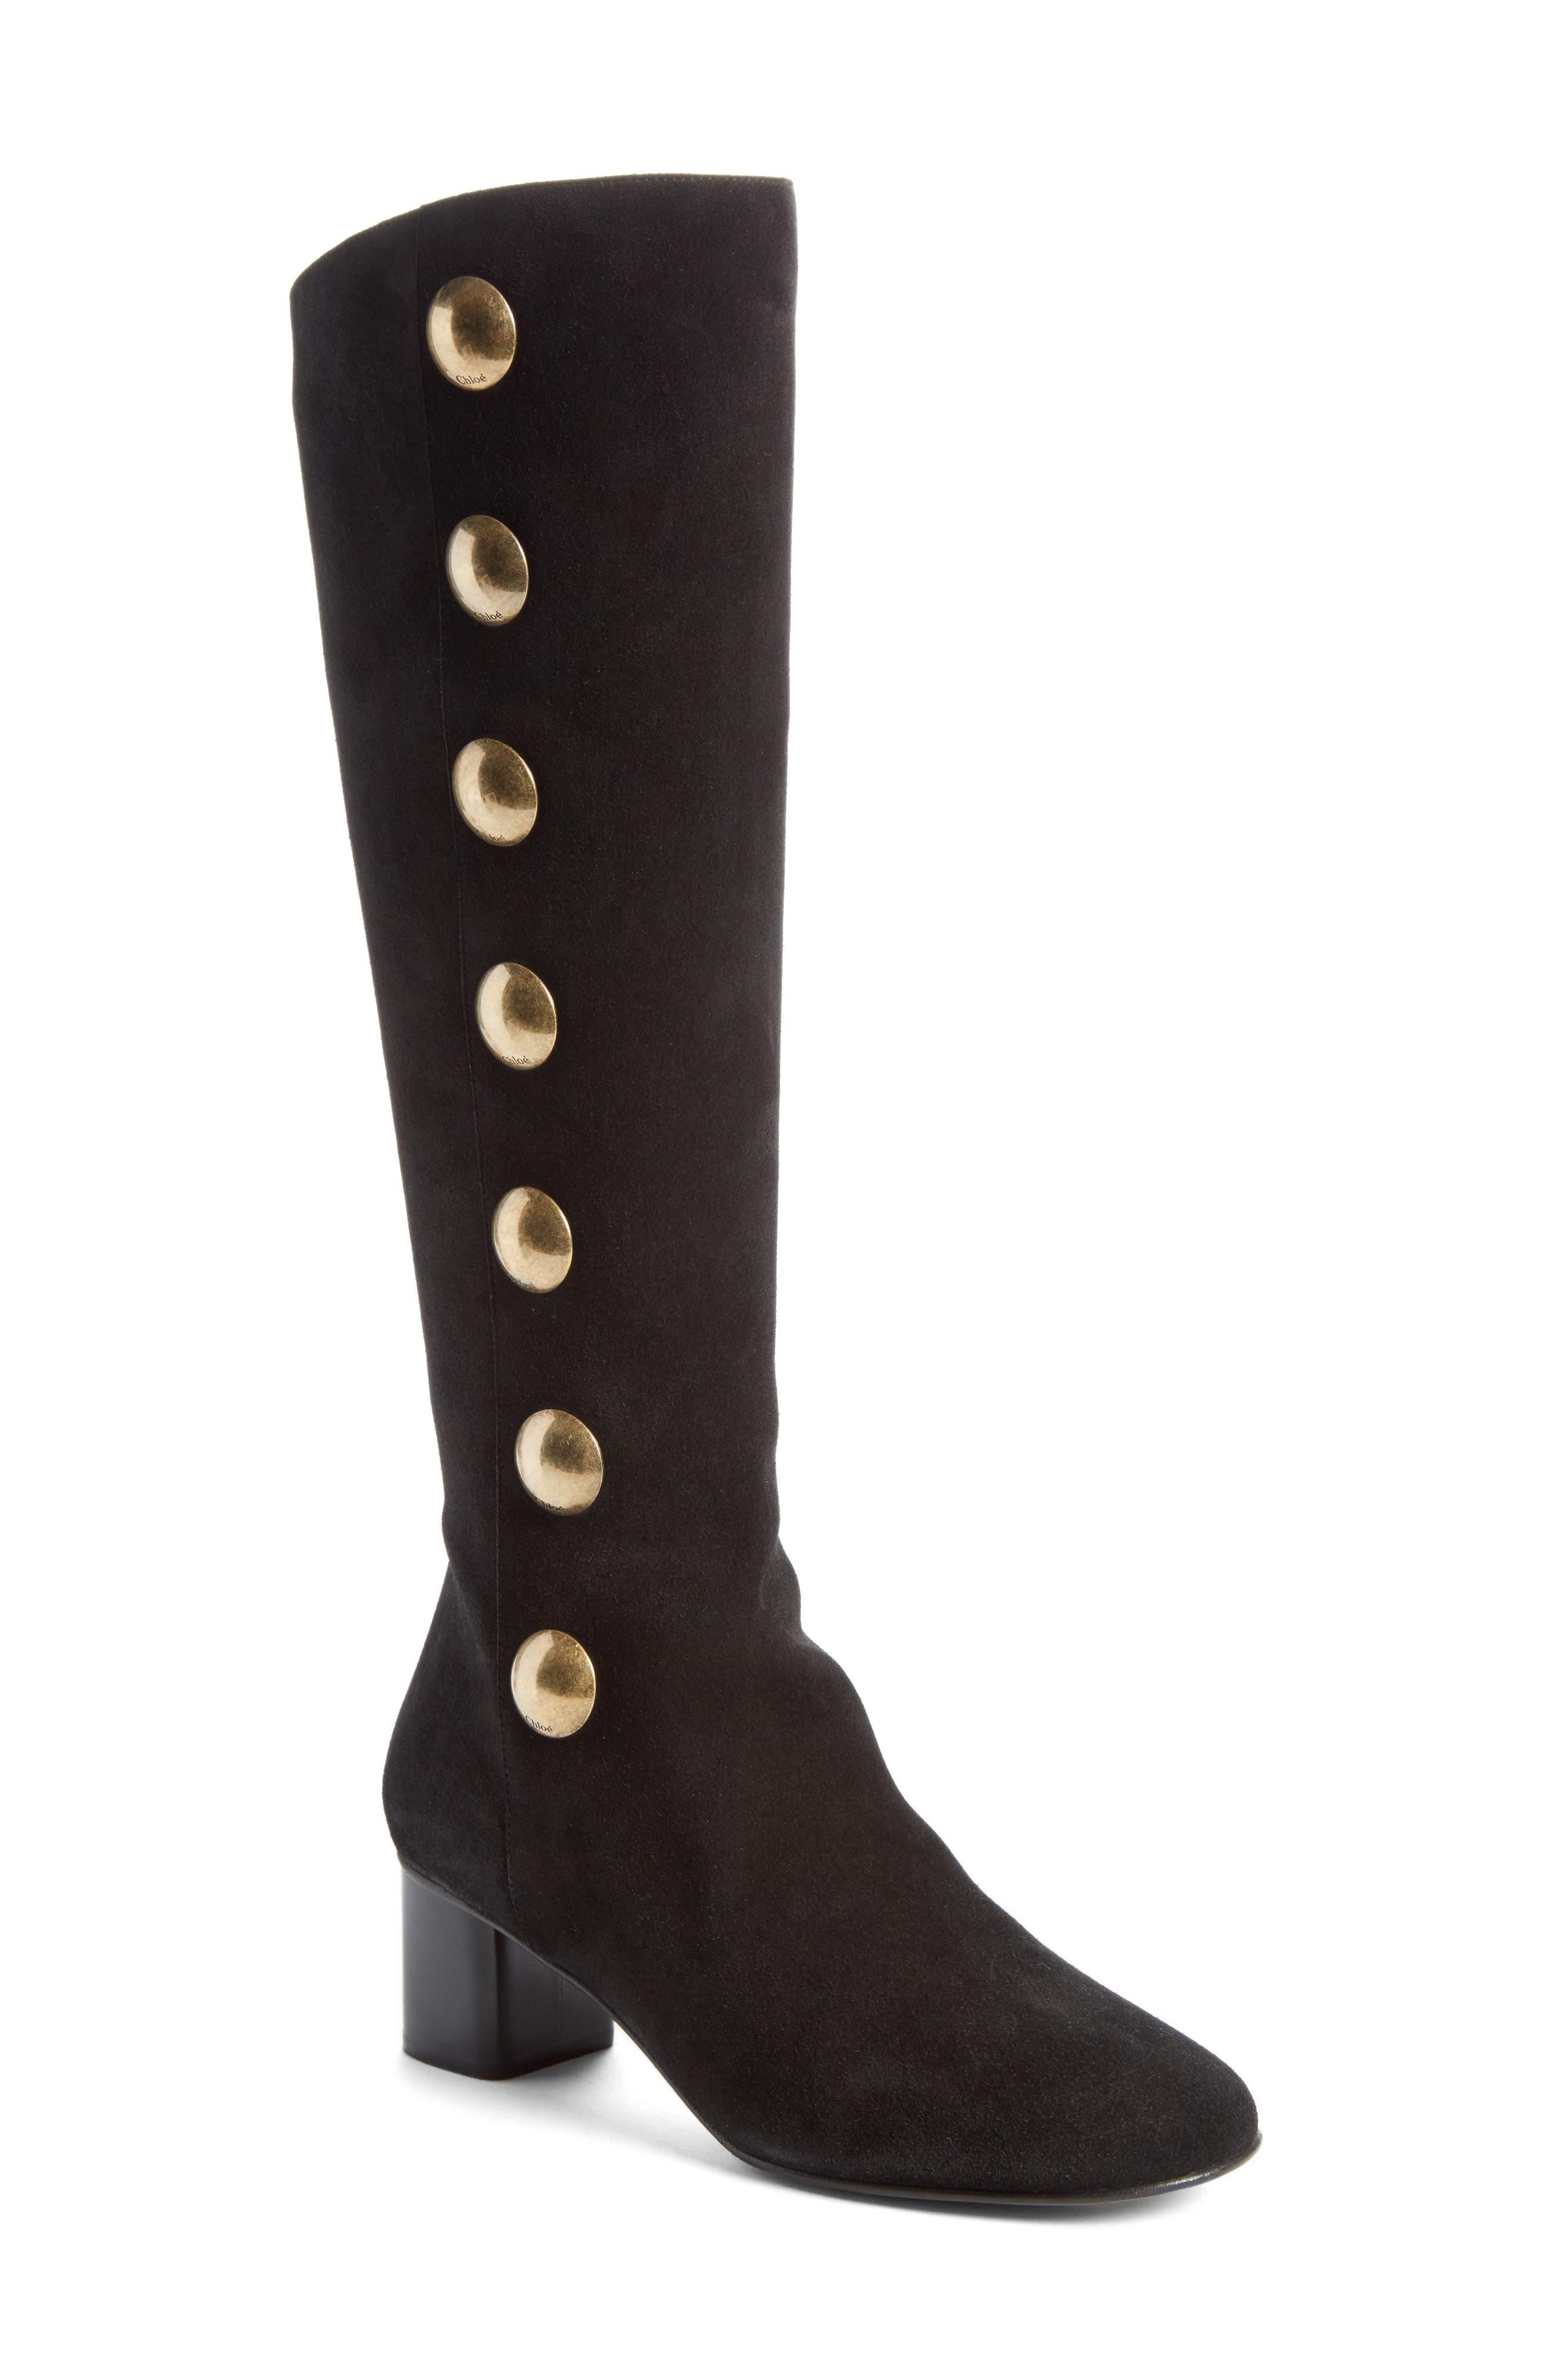 Alternate Image 1 Selected - Chloé Orlando Tall Button Boot (Women)